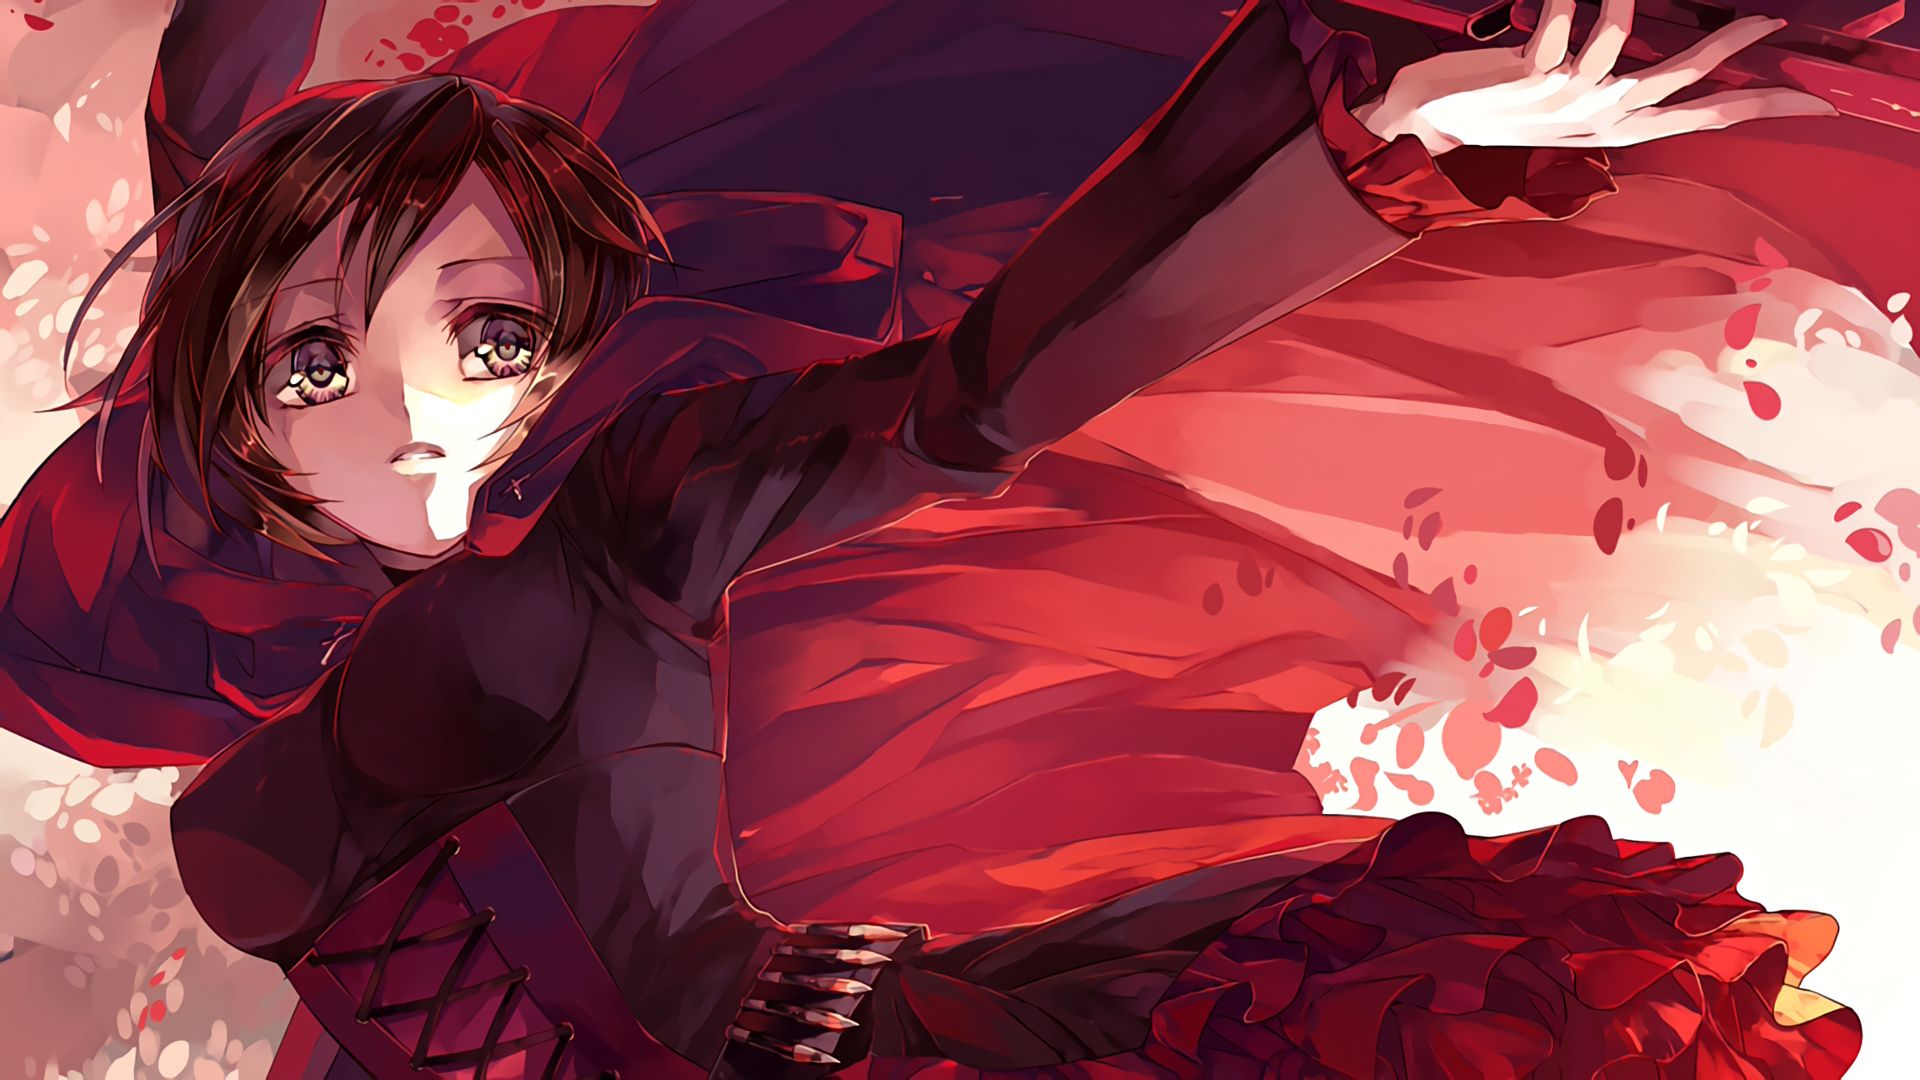 Anime Rwby Ruby Rose Wallpaper Rwby Rwby Wallpaper Anime